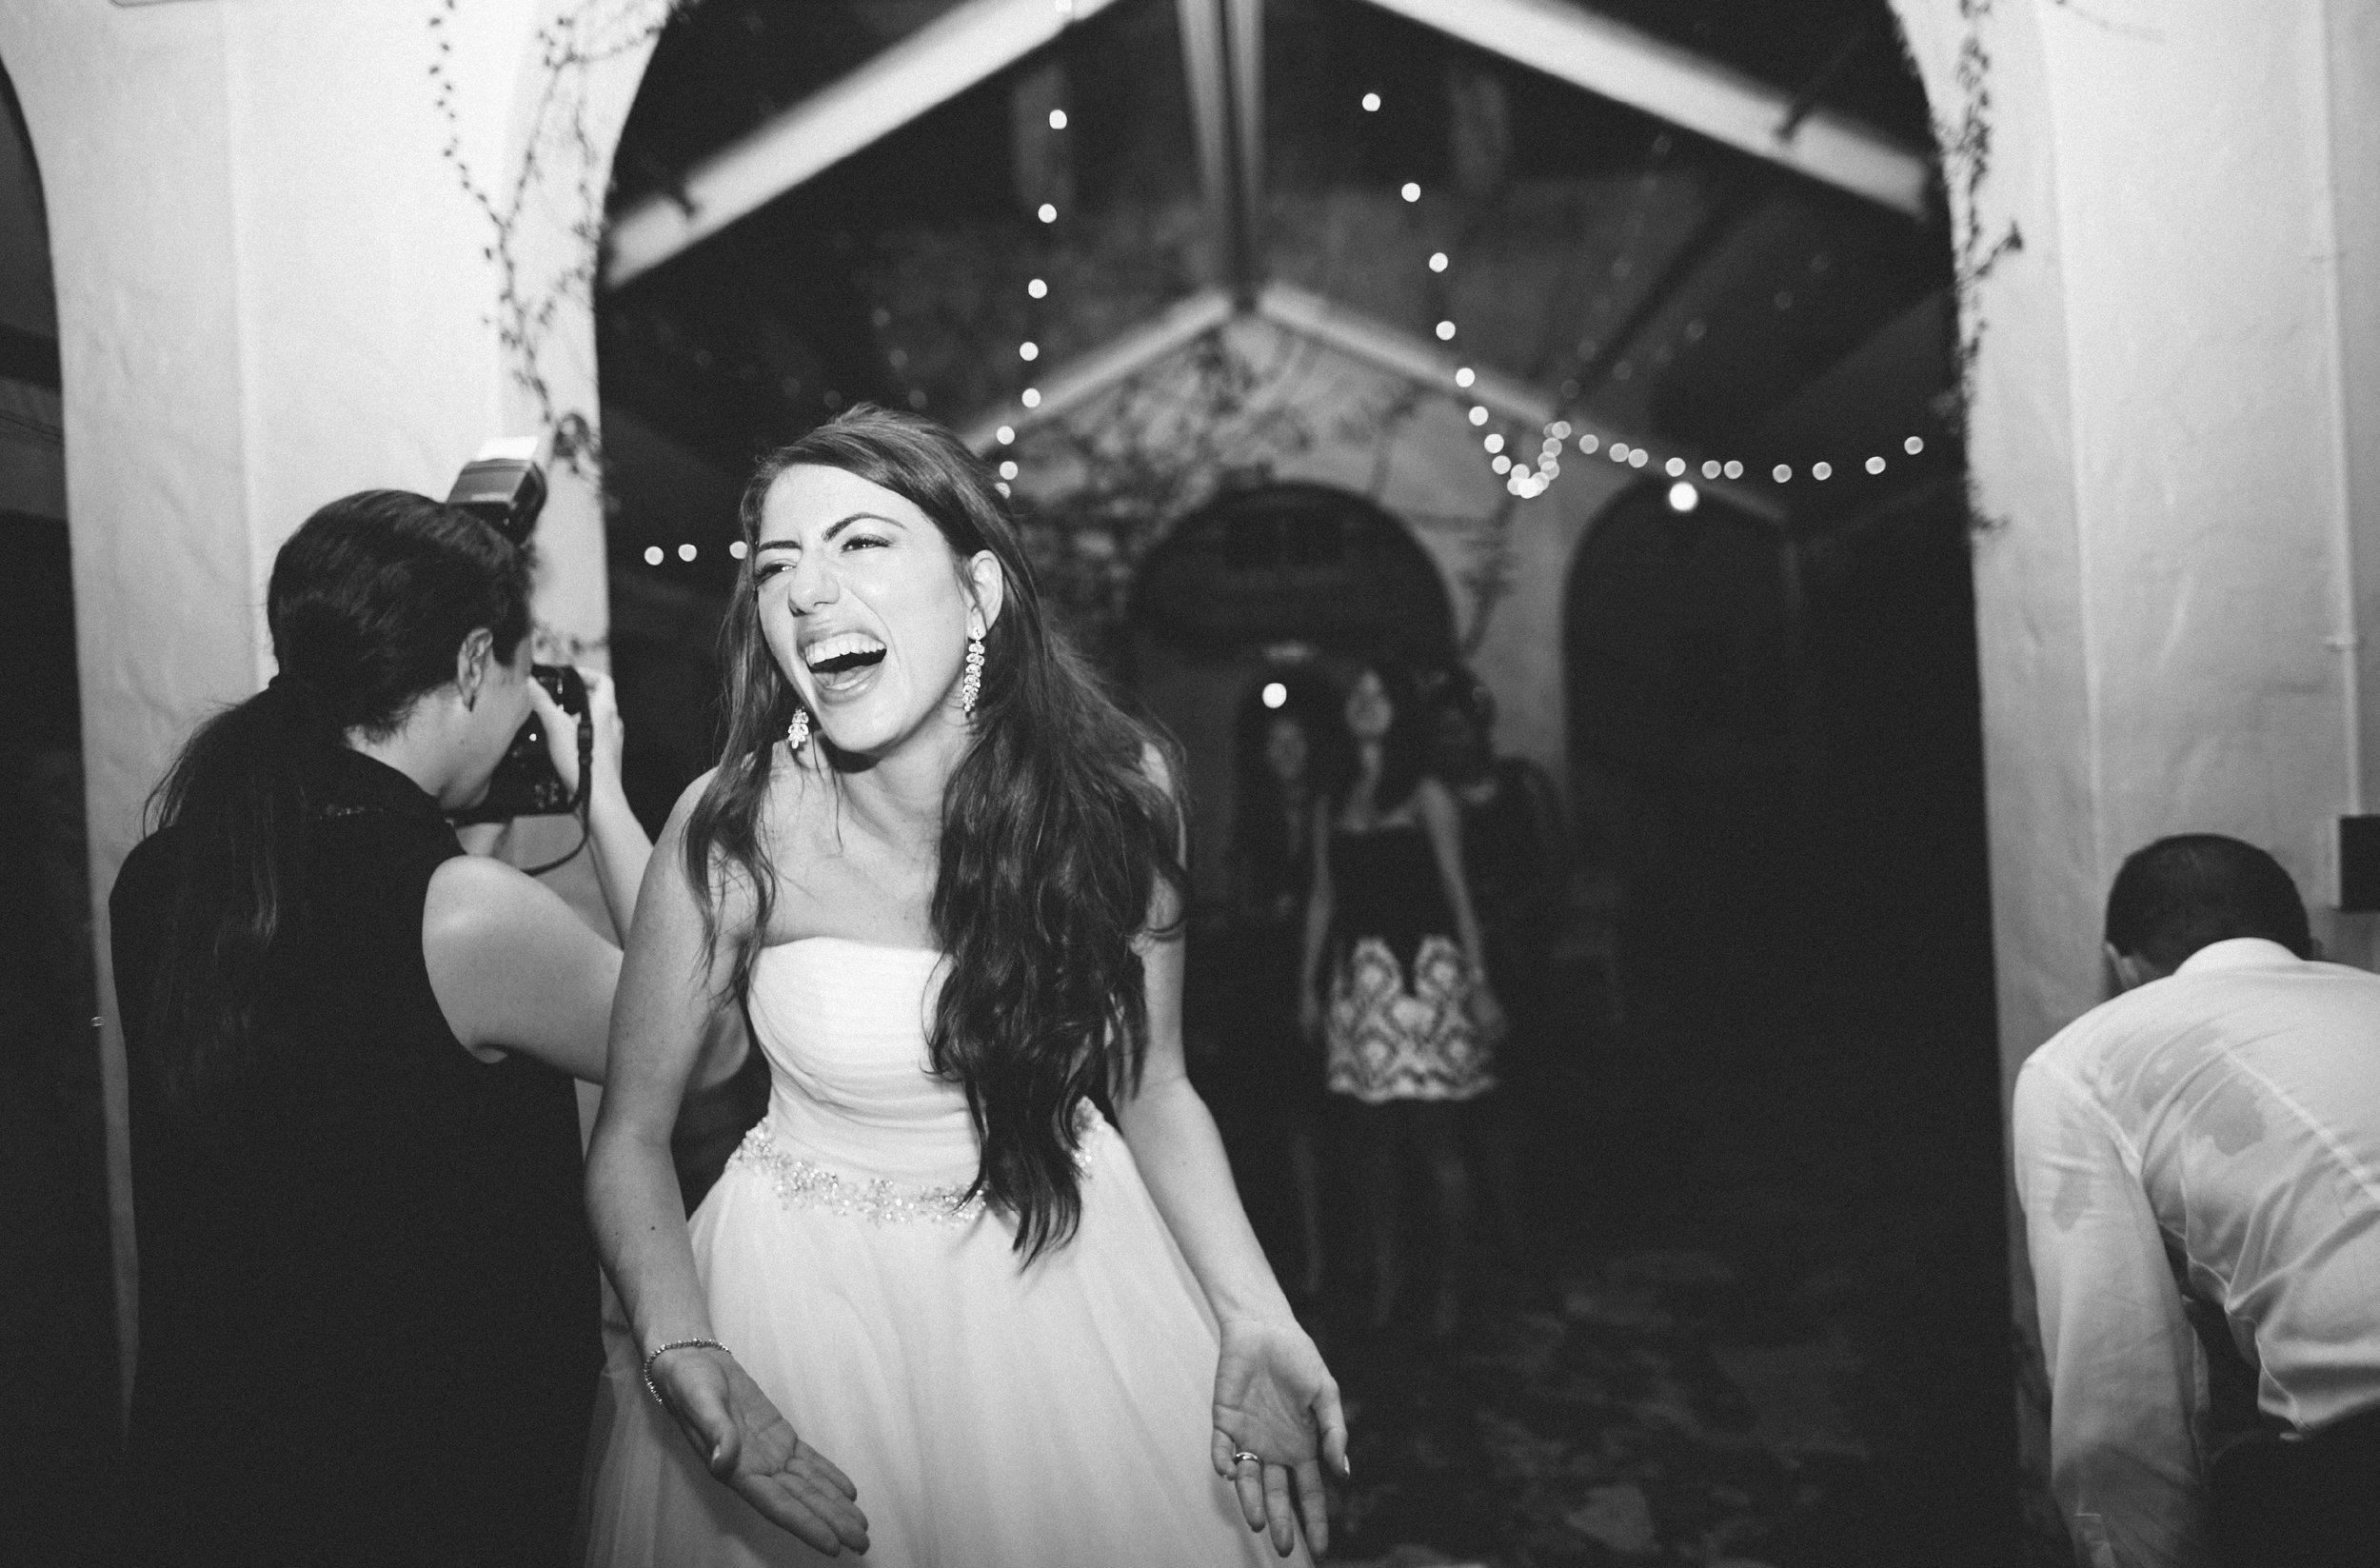 Meli + Mike Coconut Grove Wedding at Villa Woodbine82.jpg